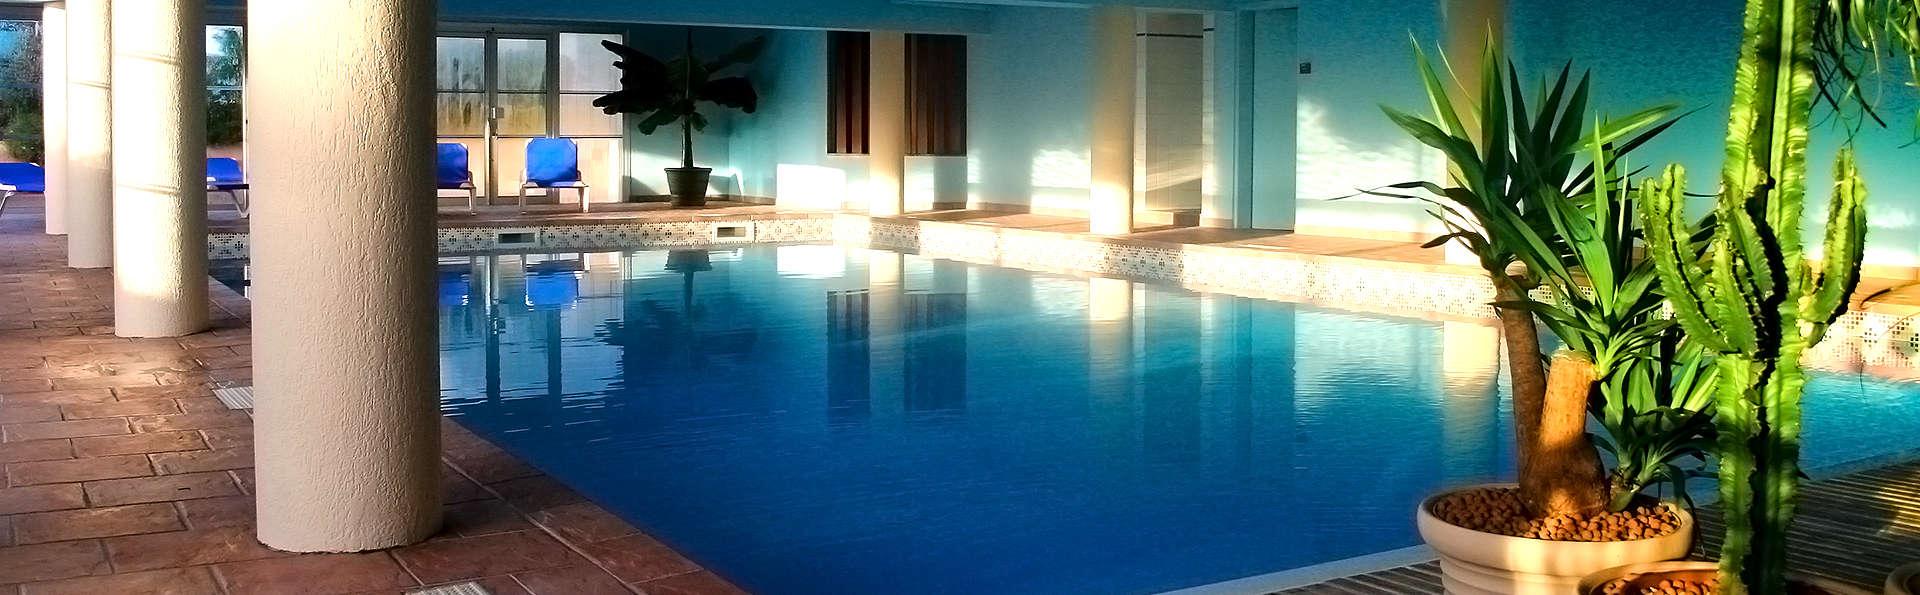 Hôtel Europa - Quiberon - EDIT_Pool4.jpg